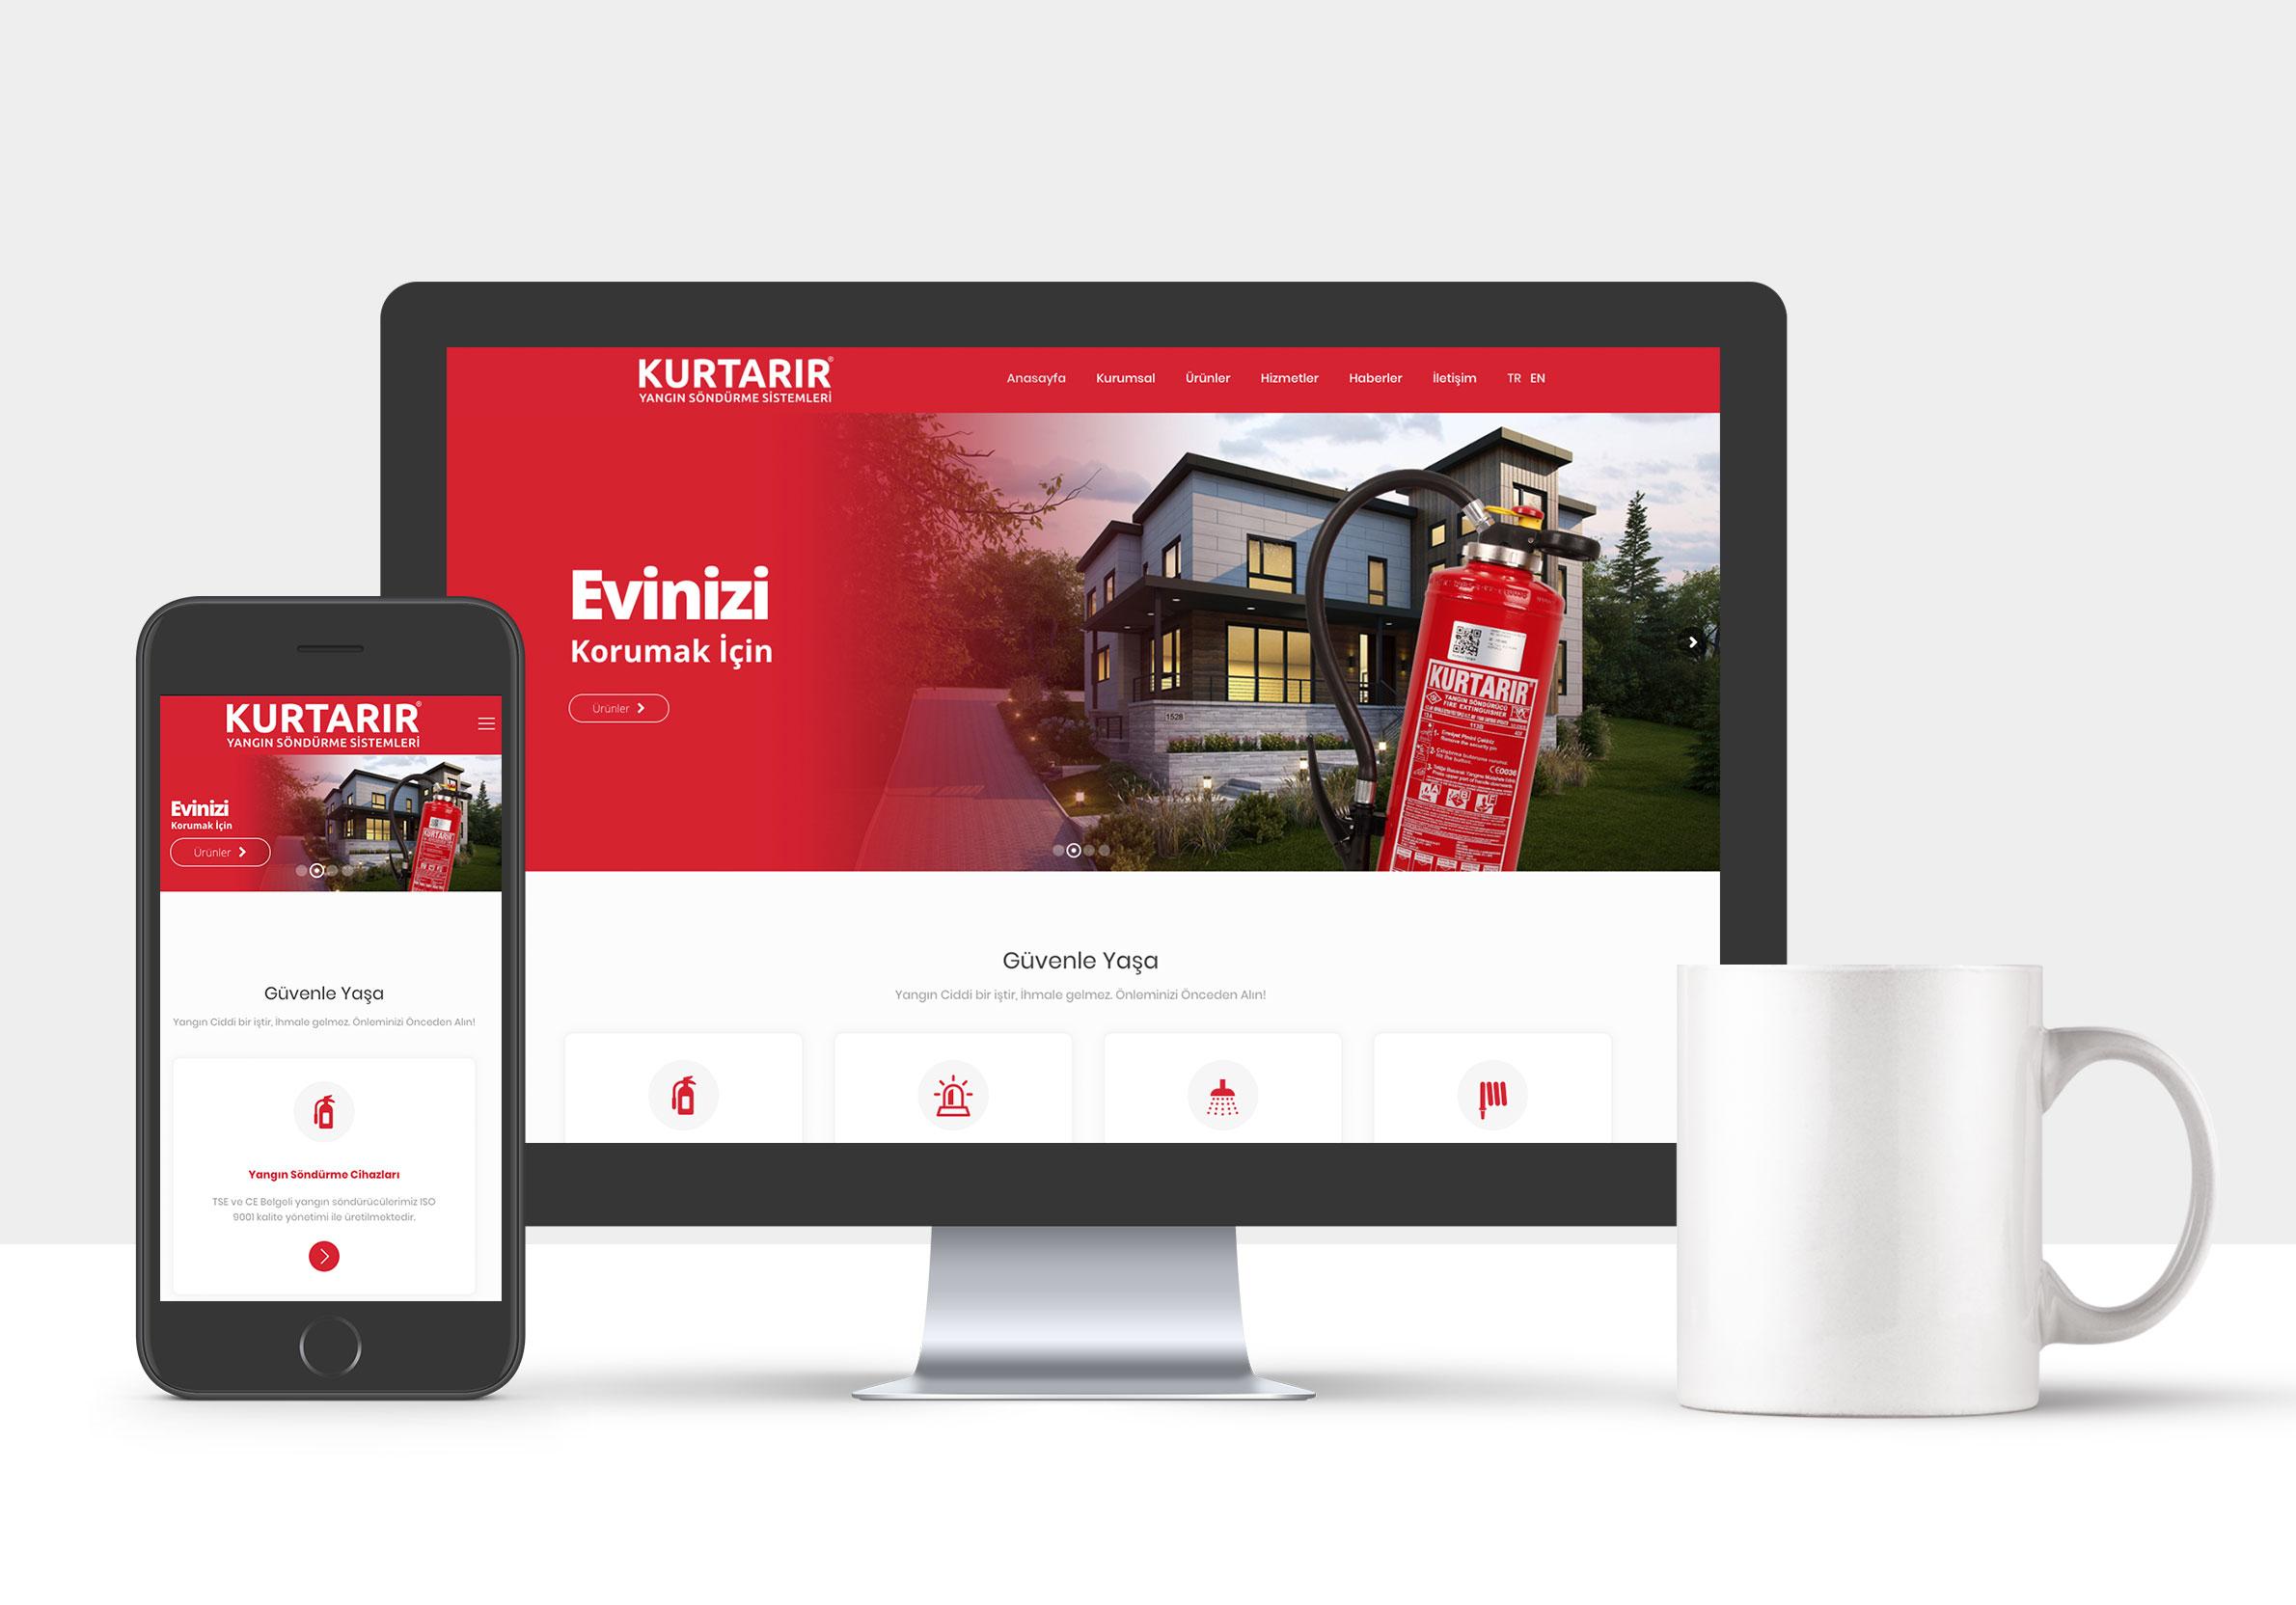 kurtarir-kurumsal-web-tasarim